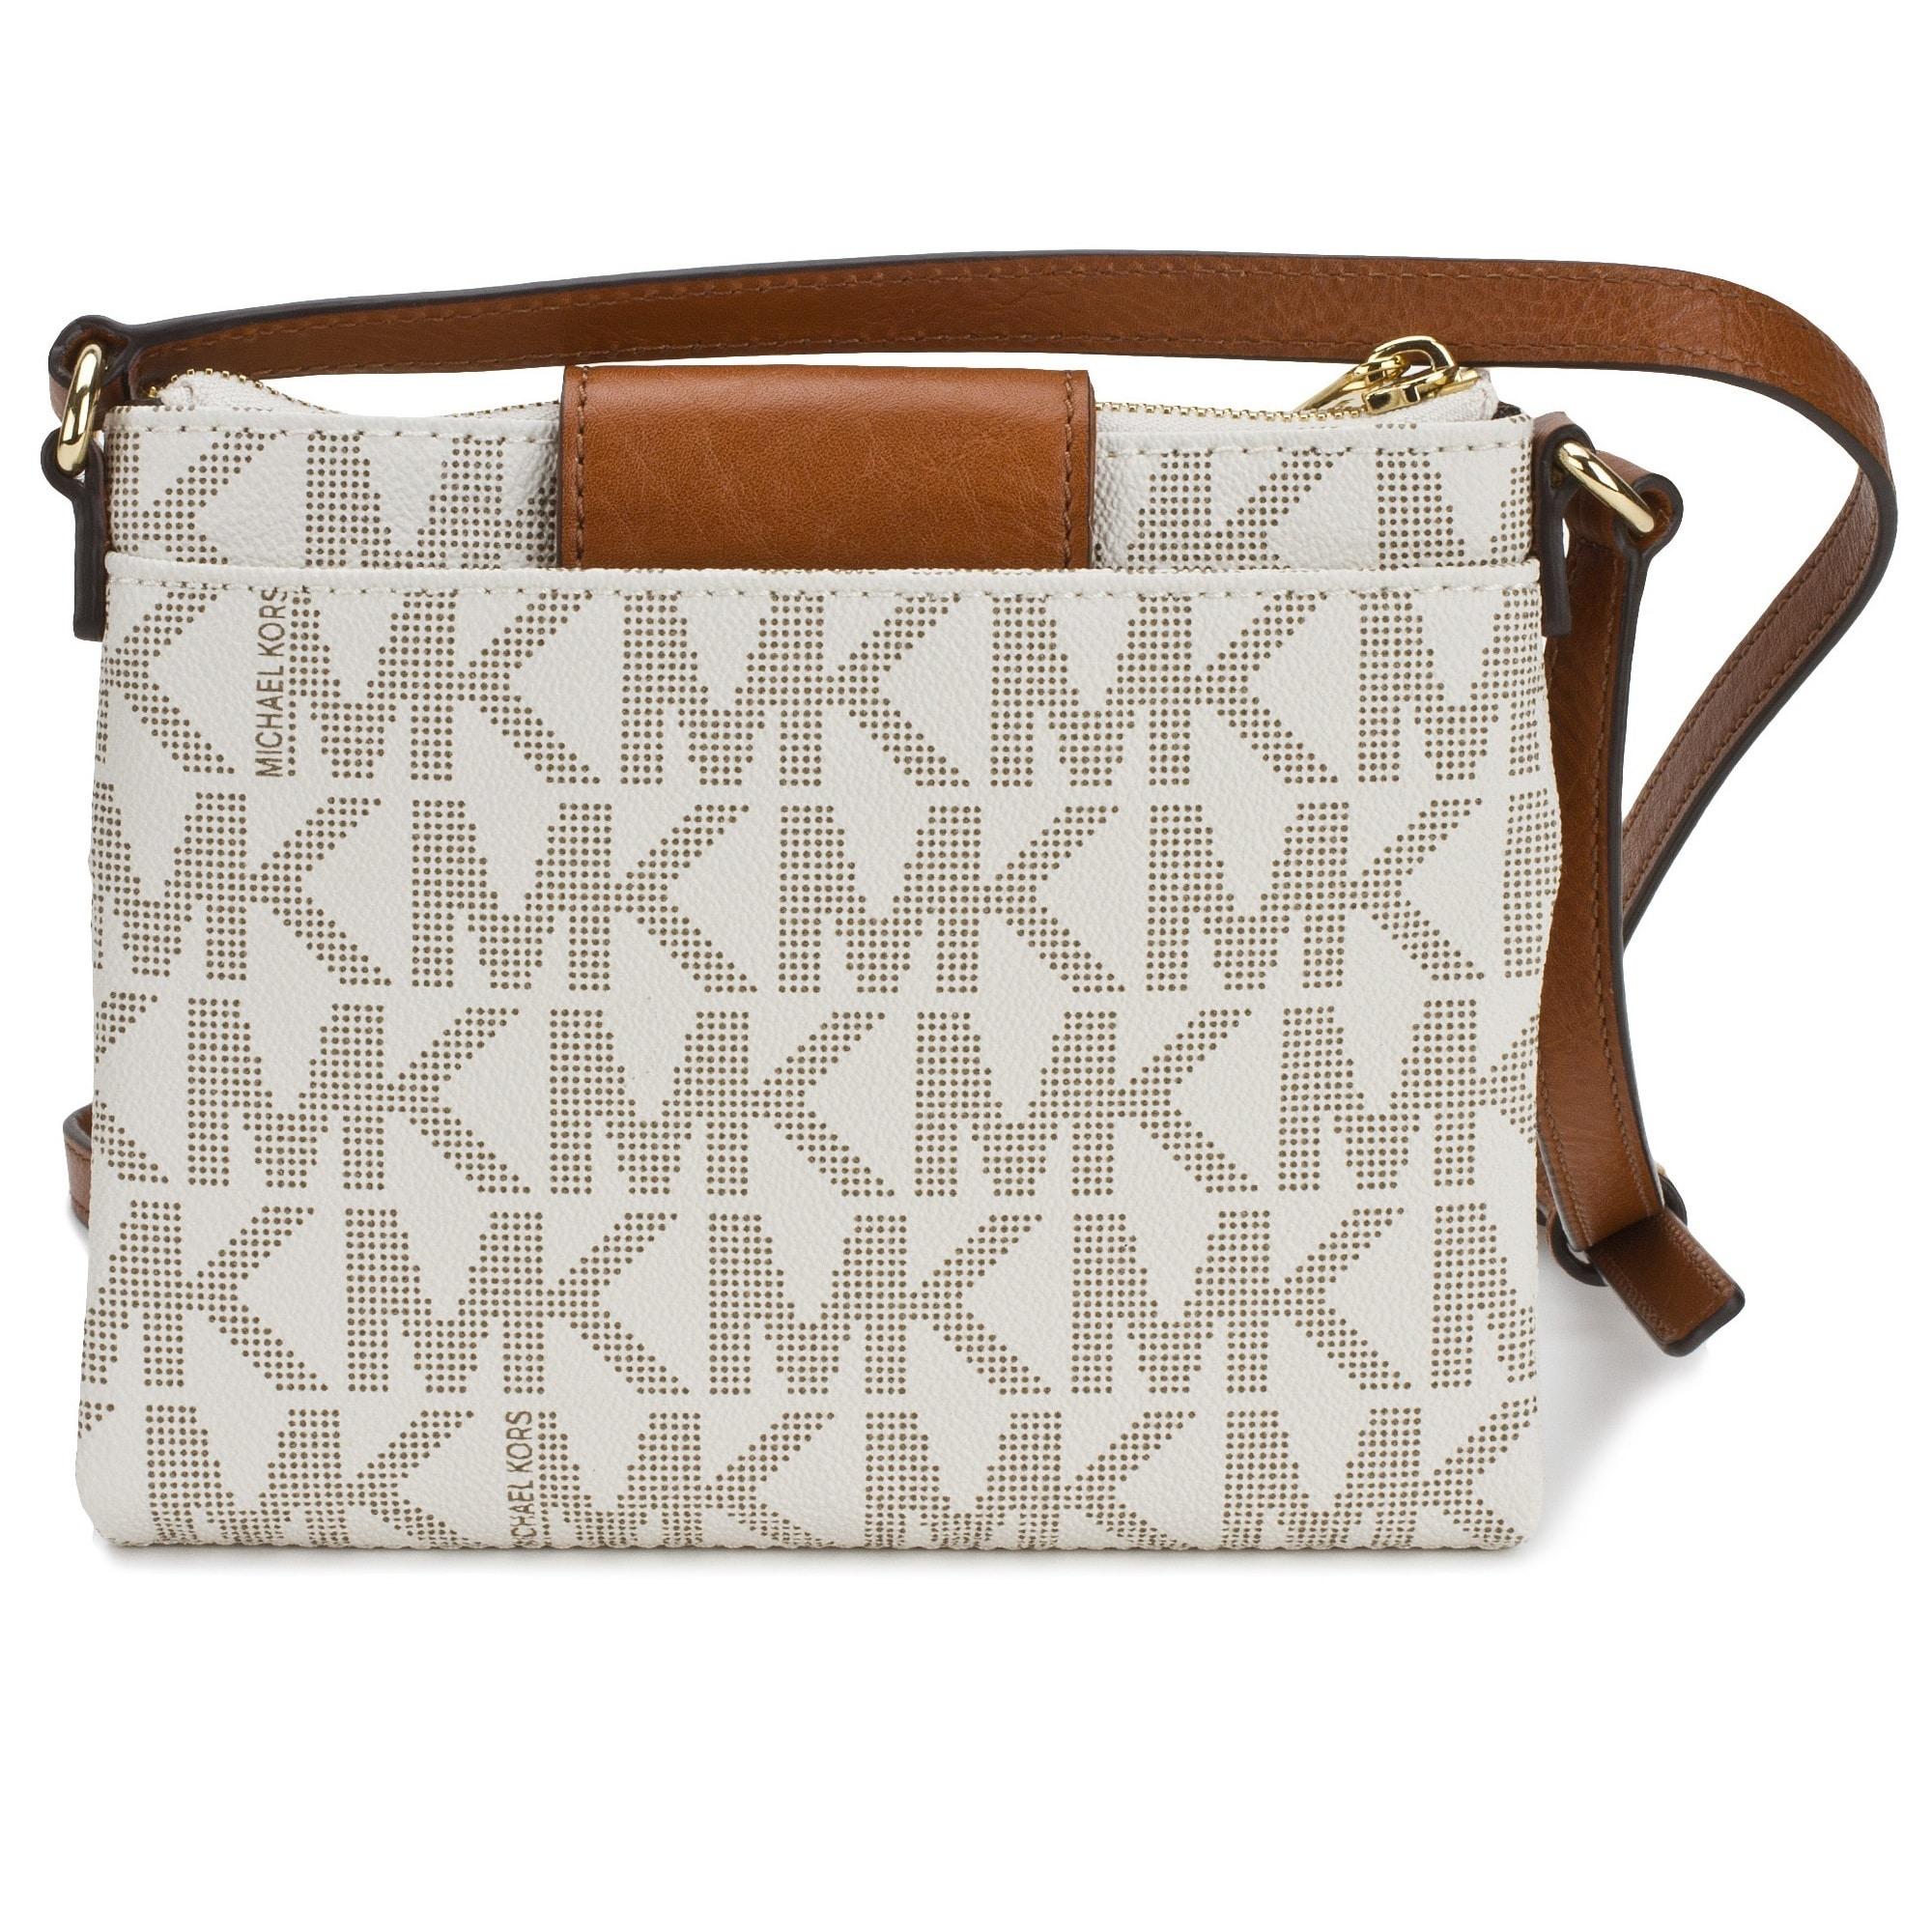 943d8252efdf Shop Michael Kors Fulton Large Vanilla Signature Crossbody Handbag - Free  Shipping Today - Overstock - 9613573